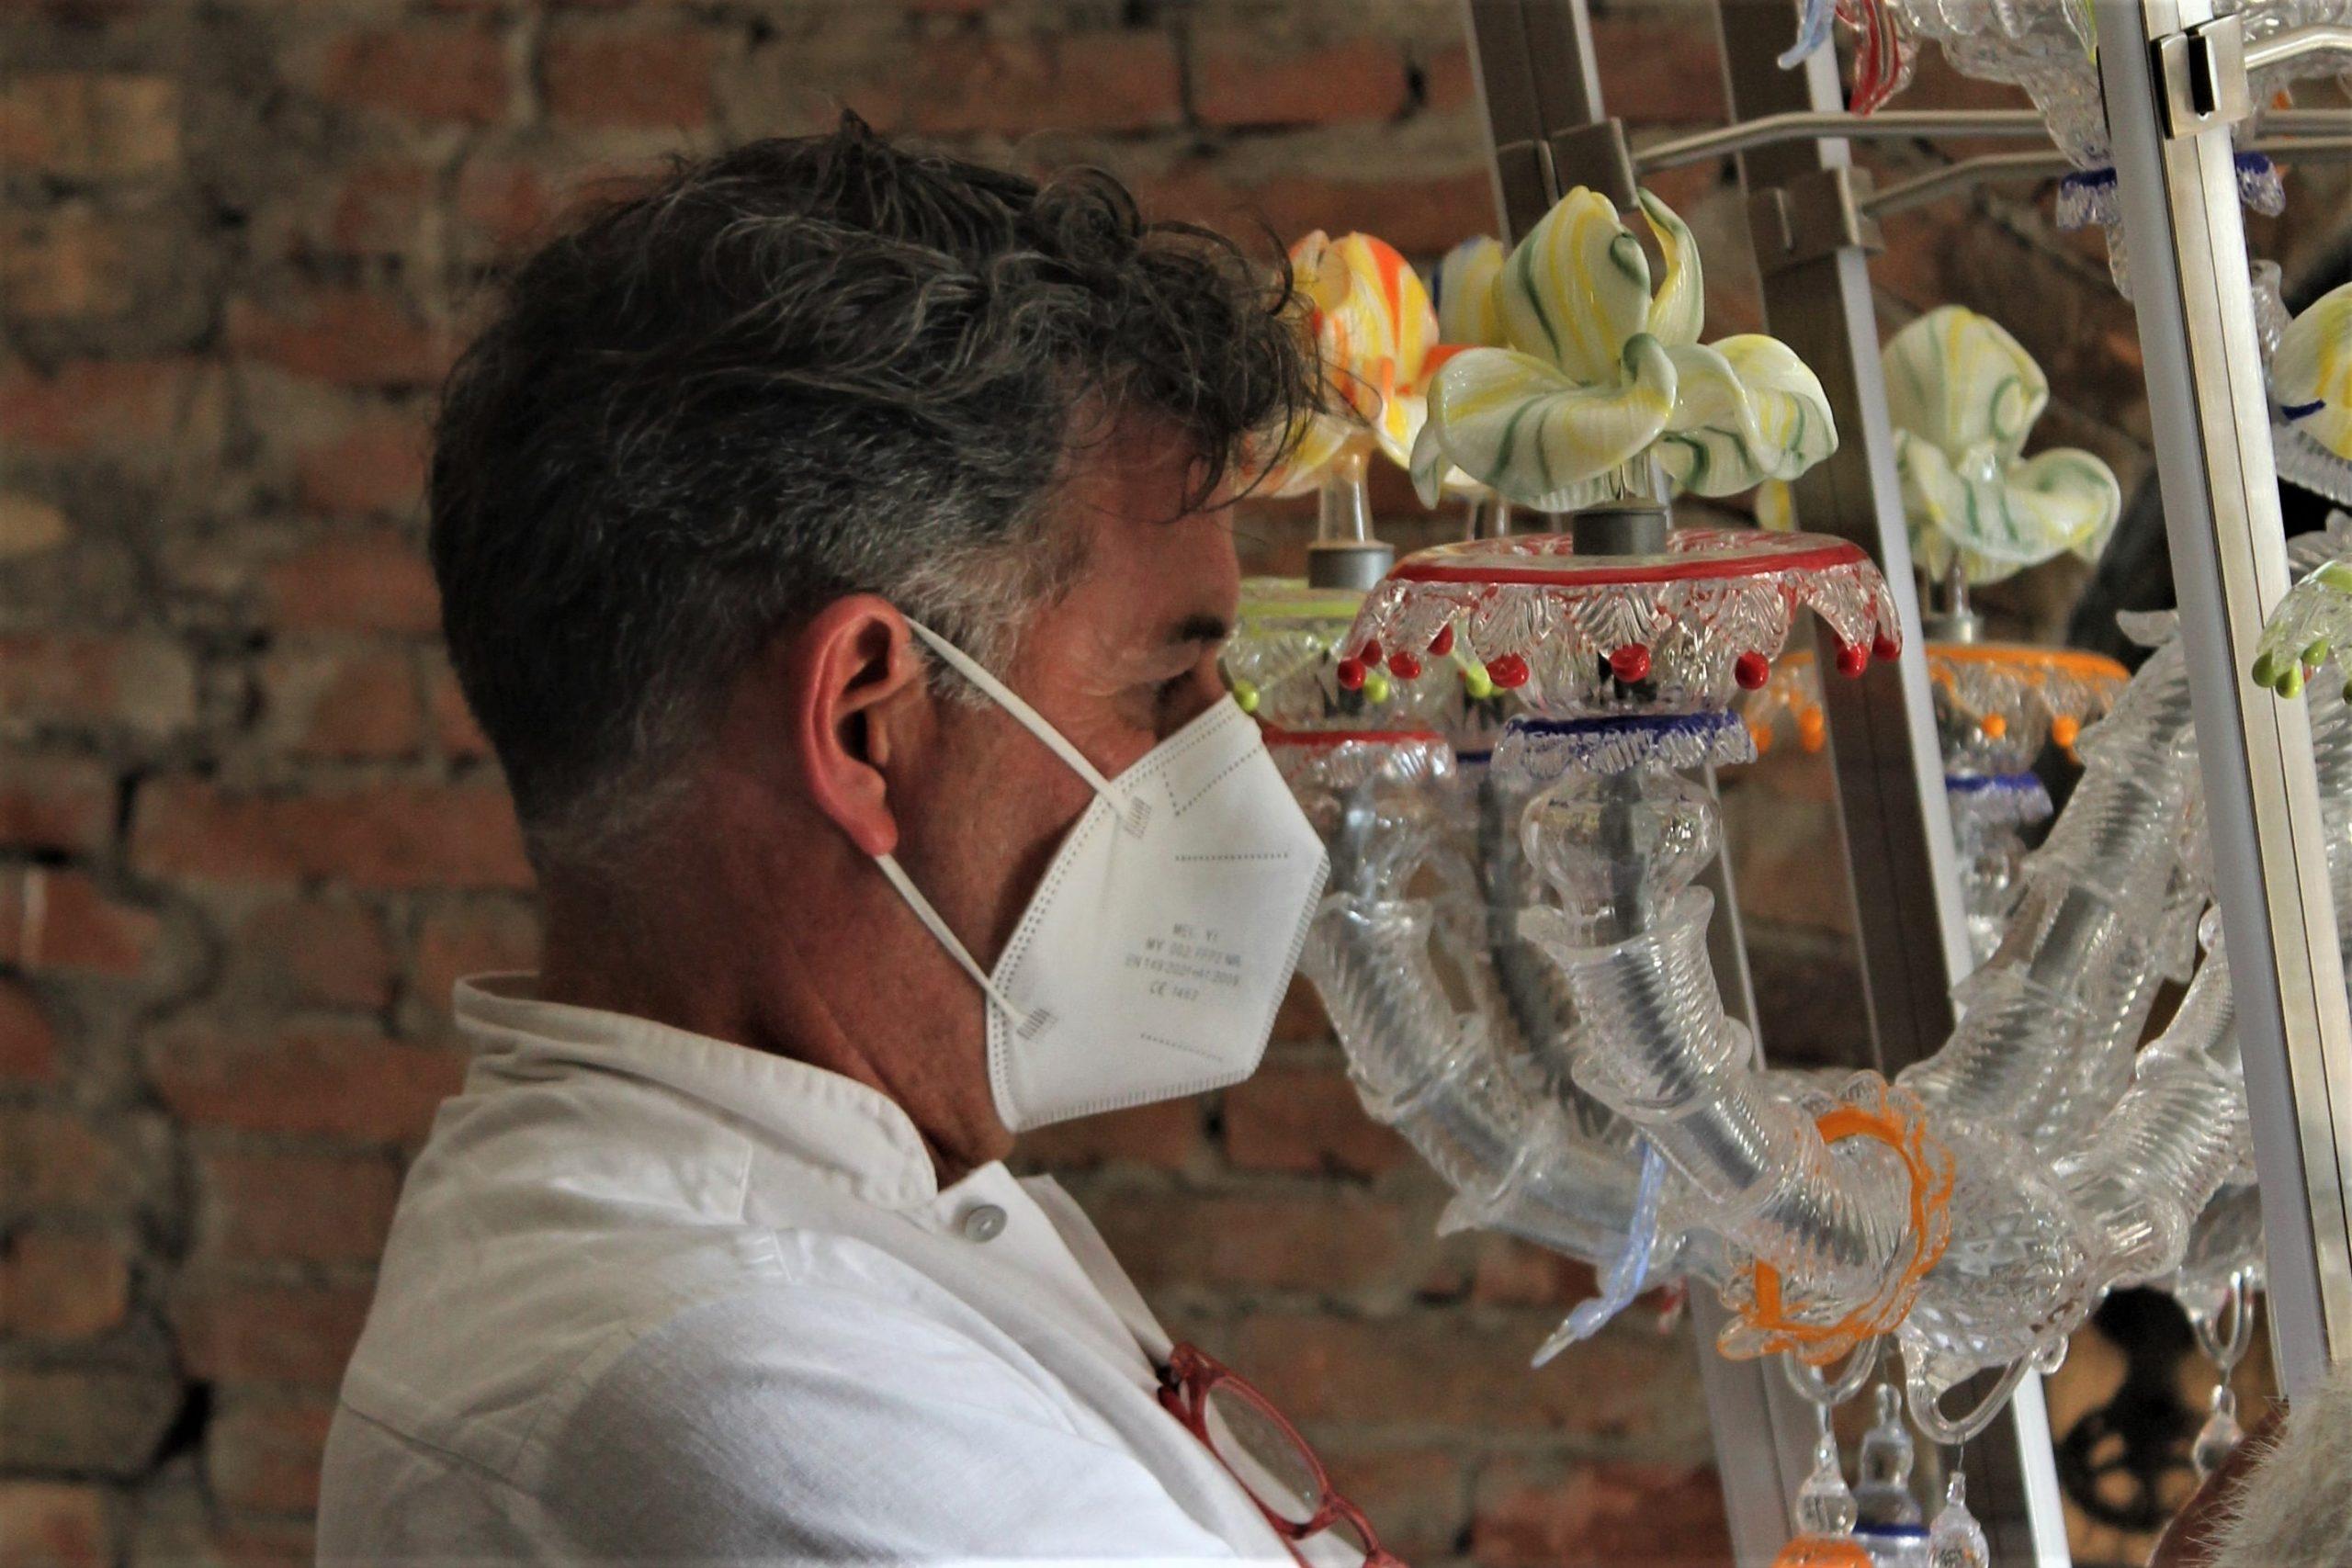 Andrea Anastasio working at Berengo Studio